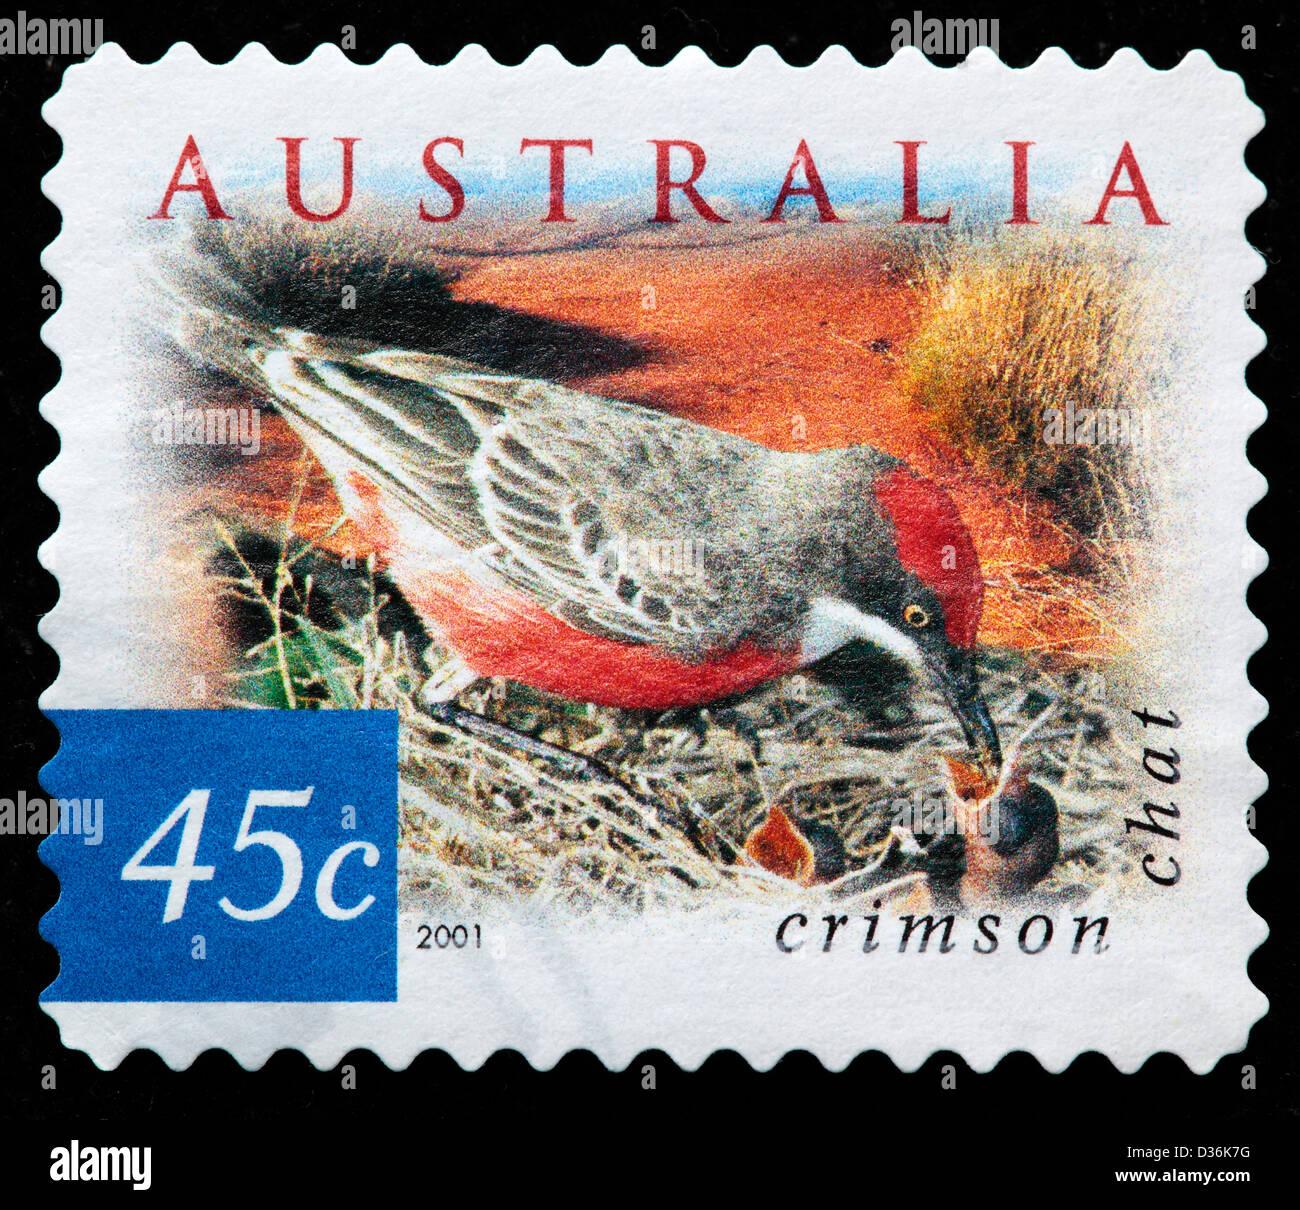 Crimson chat, postage stamp, Australia, 2001 - Stock Image